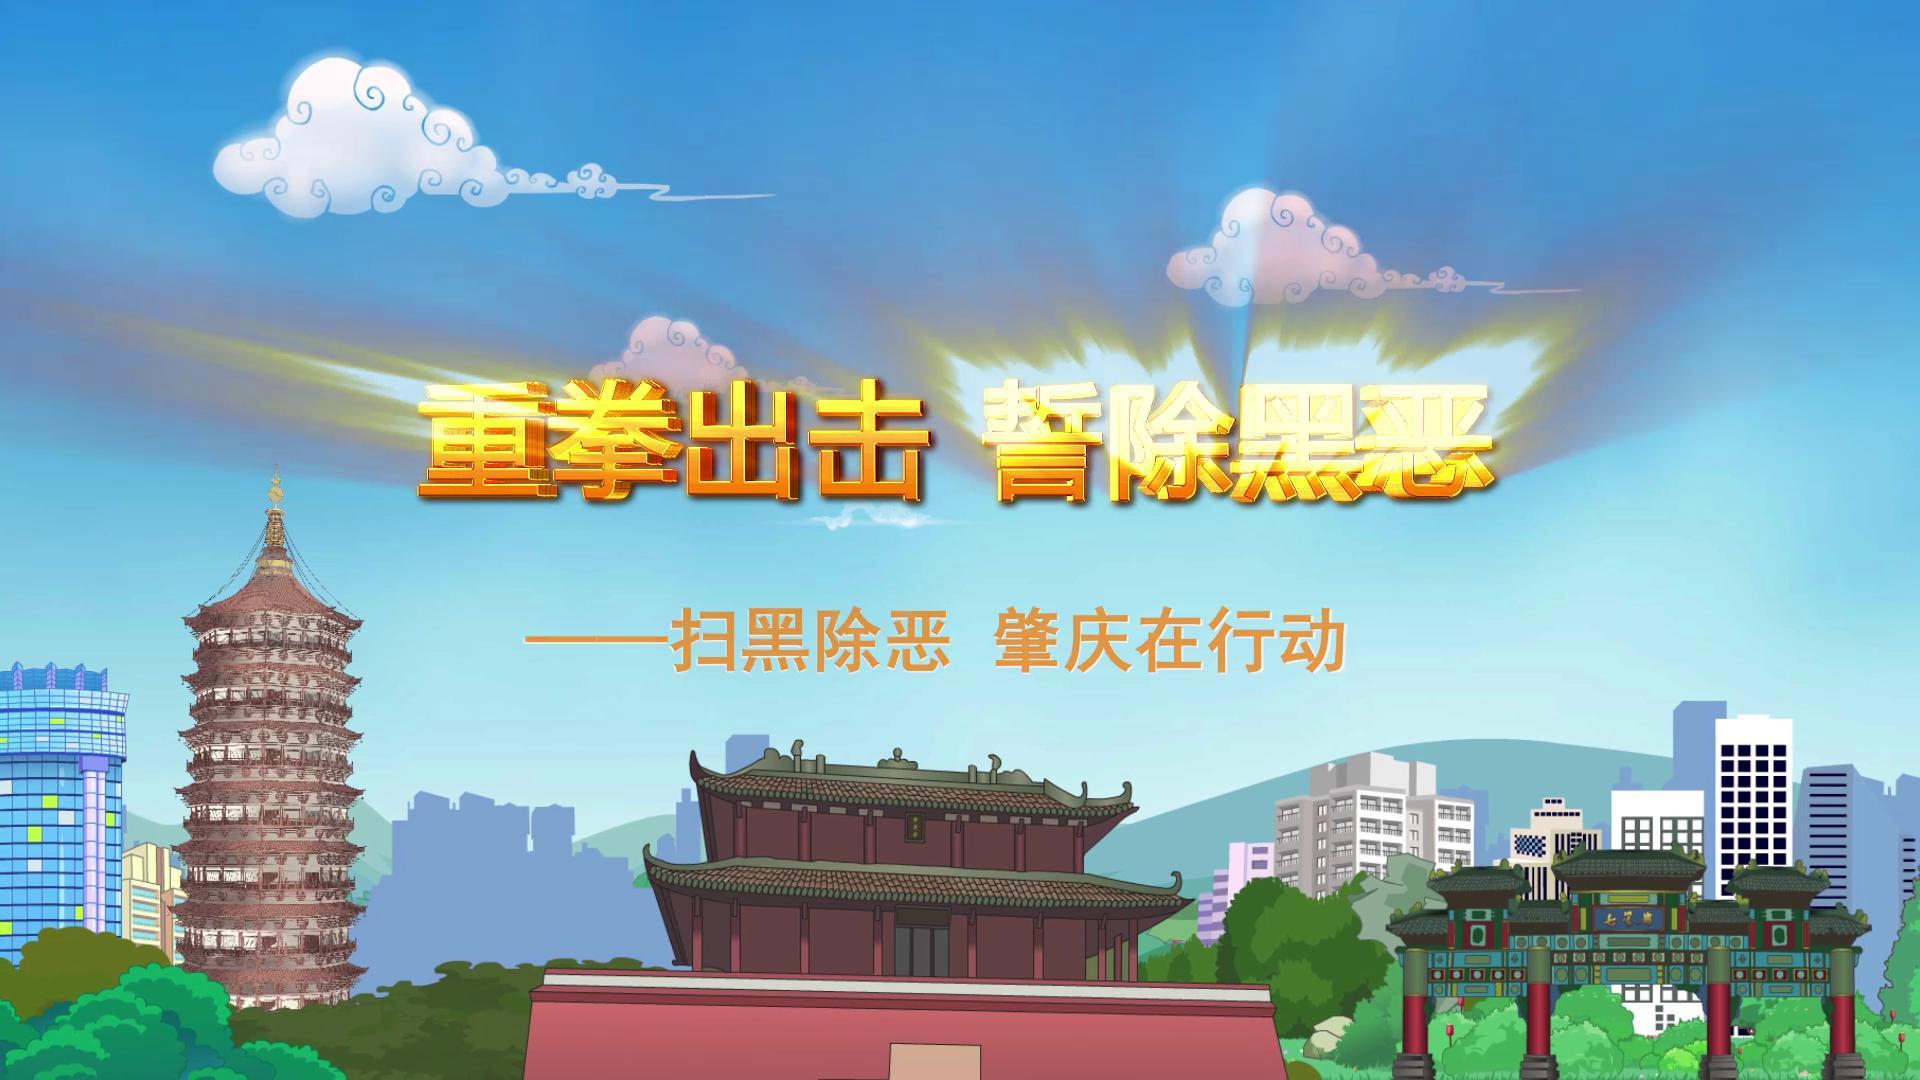 "2019nba虎扑篮球:市""扫黑除恶""专项斗争公益动漫系列宣传片30S高清"